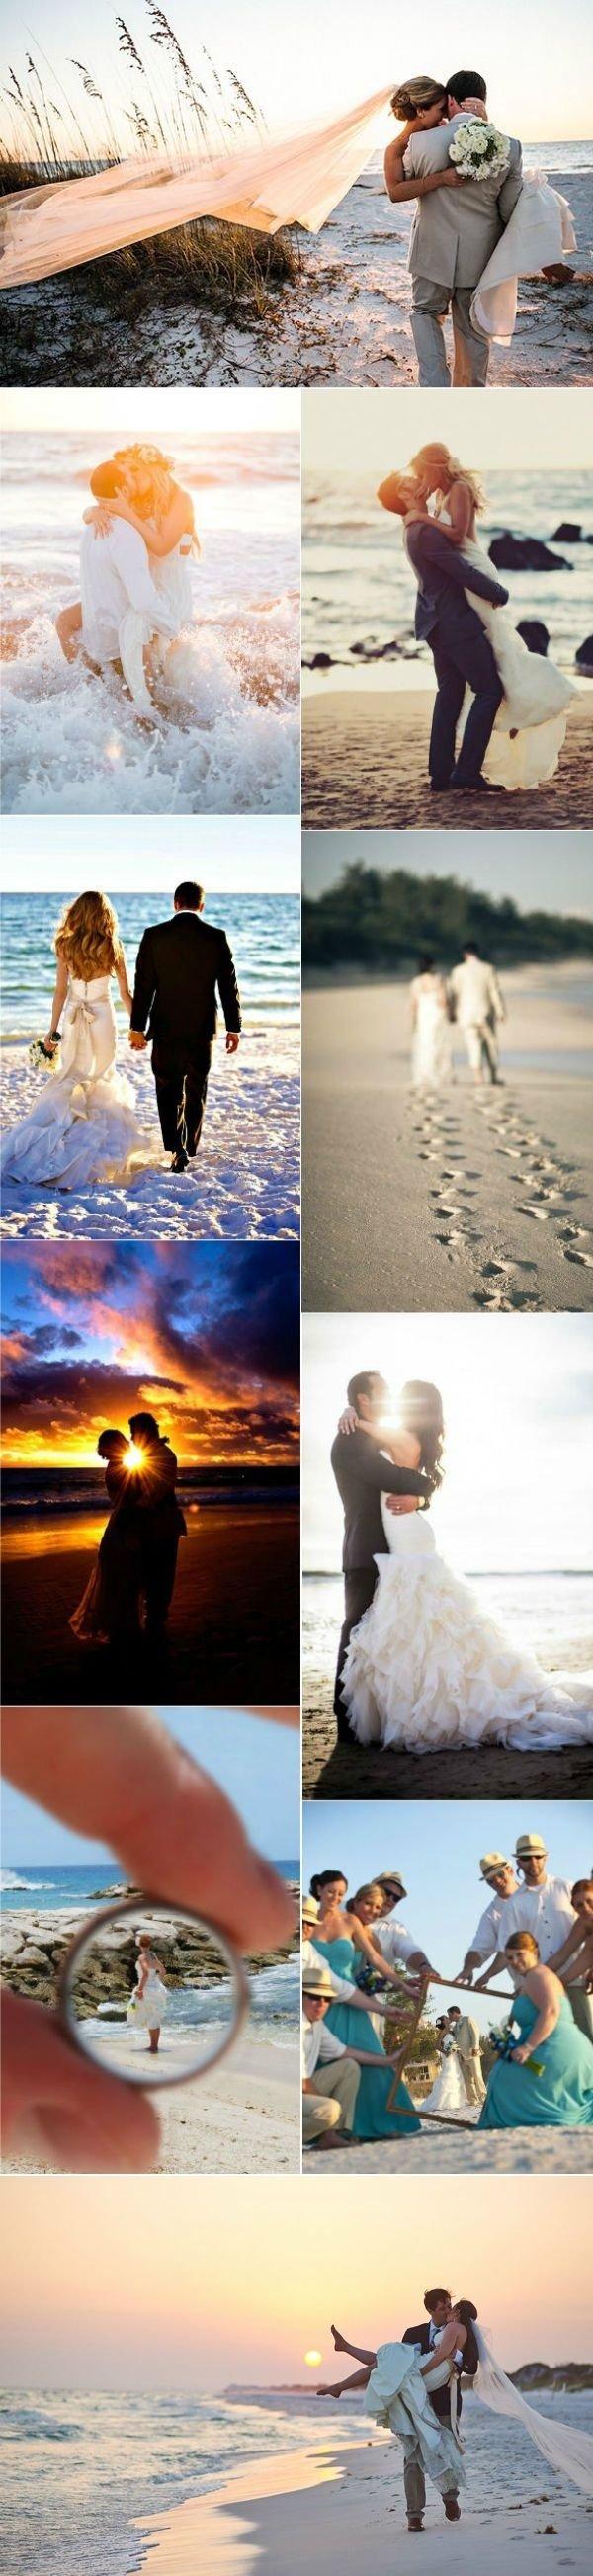 10 Wonderful Ideas For A Beach Wedding 927 best beach wedding ideas images on pinterest beach weddings 1 2021